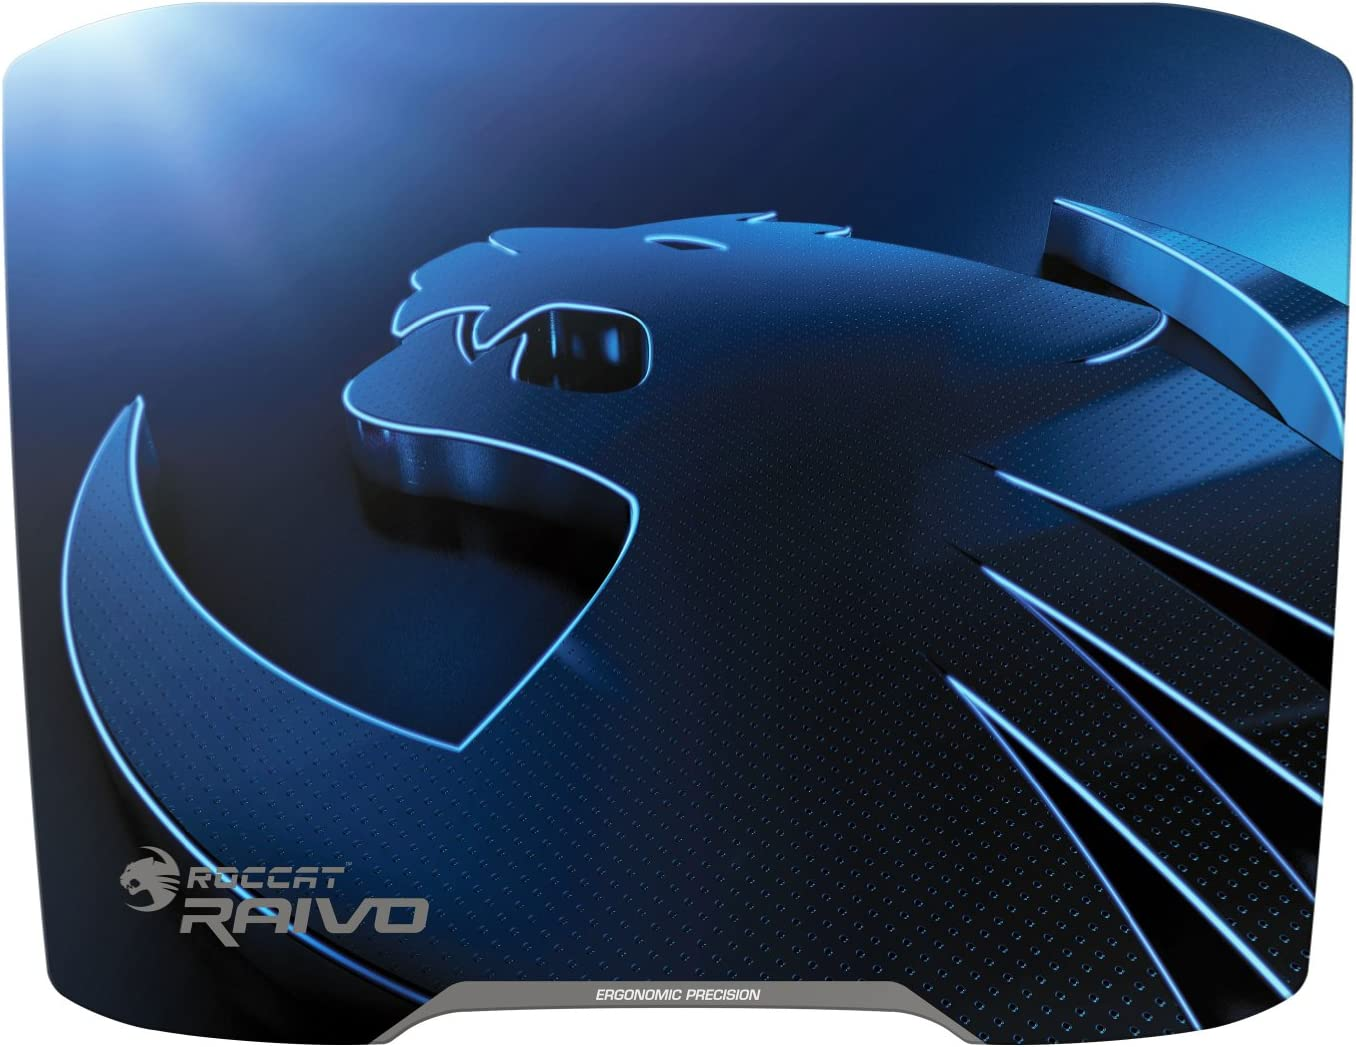 ROCCAT RAIVO 2mm High-Velocity Ergonomic Gaming Mousepad, Lightning Blue